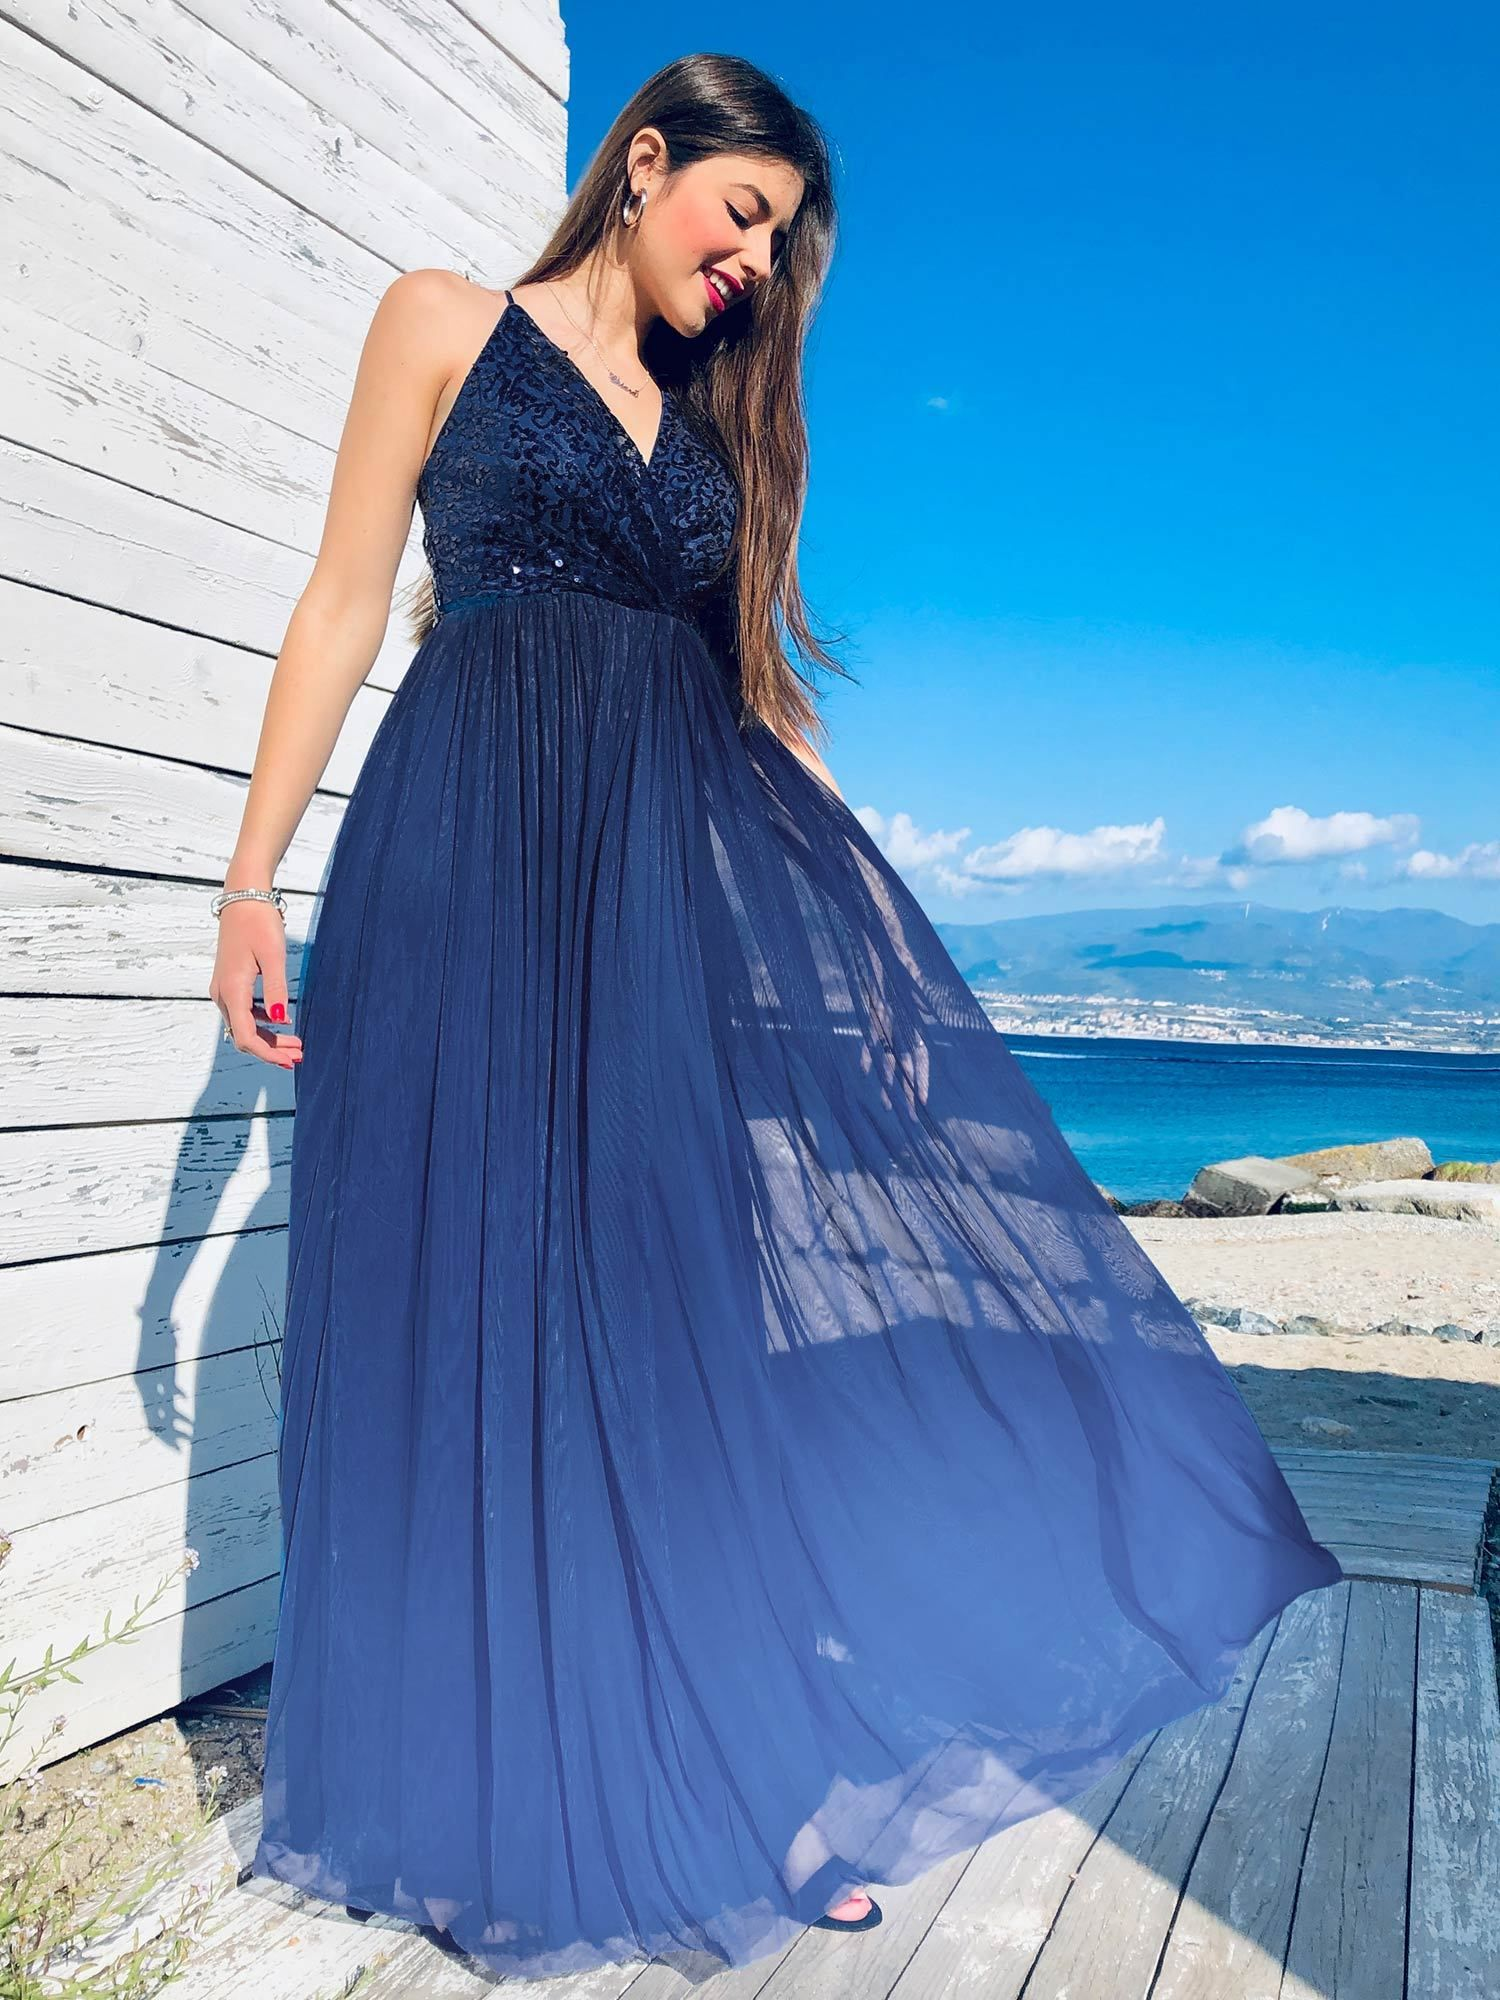 Neue Kollektion 2020 in 2020 | Kleid ombre, Blaue ...